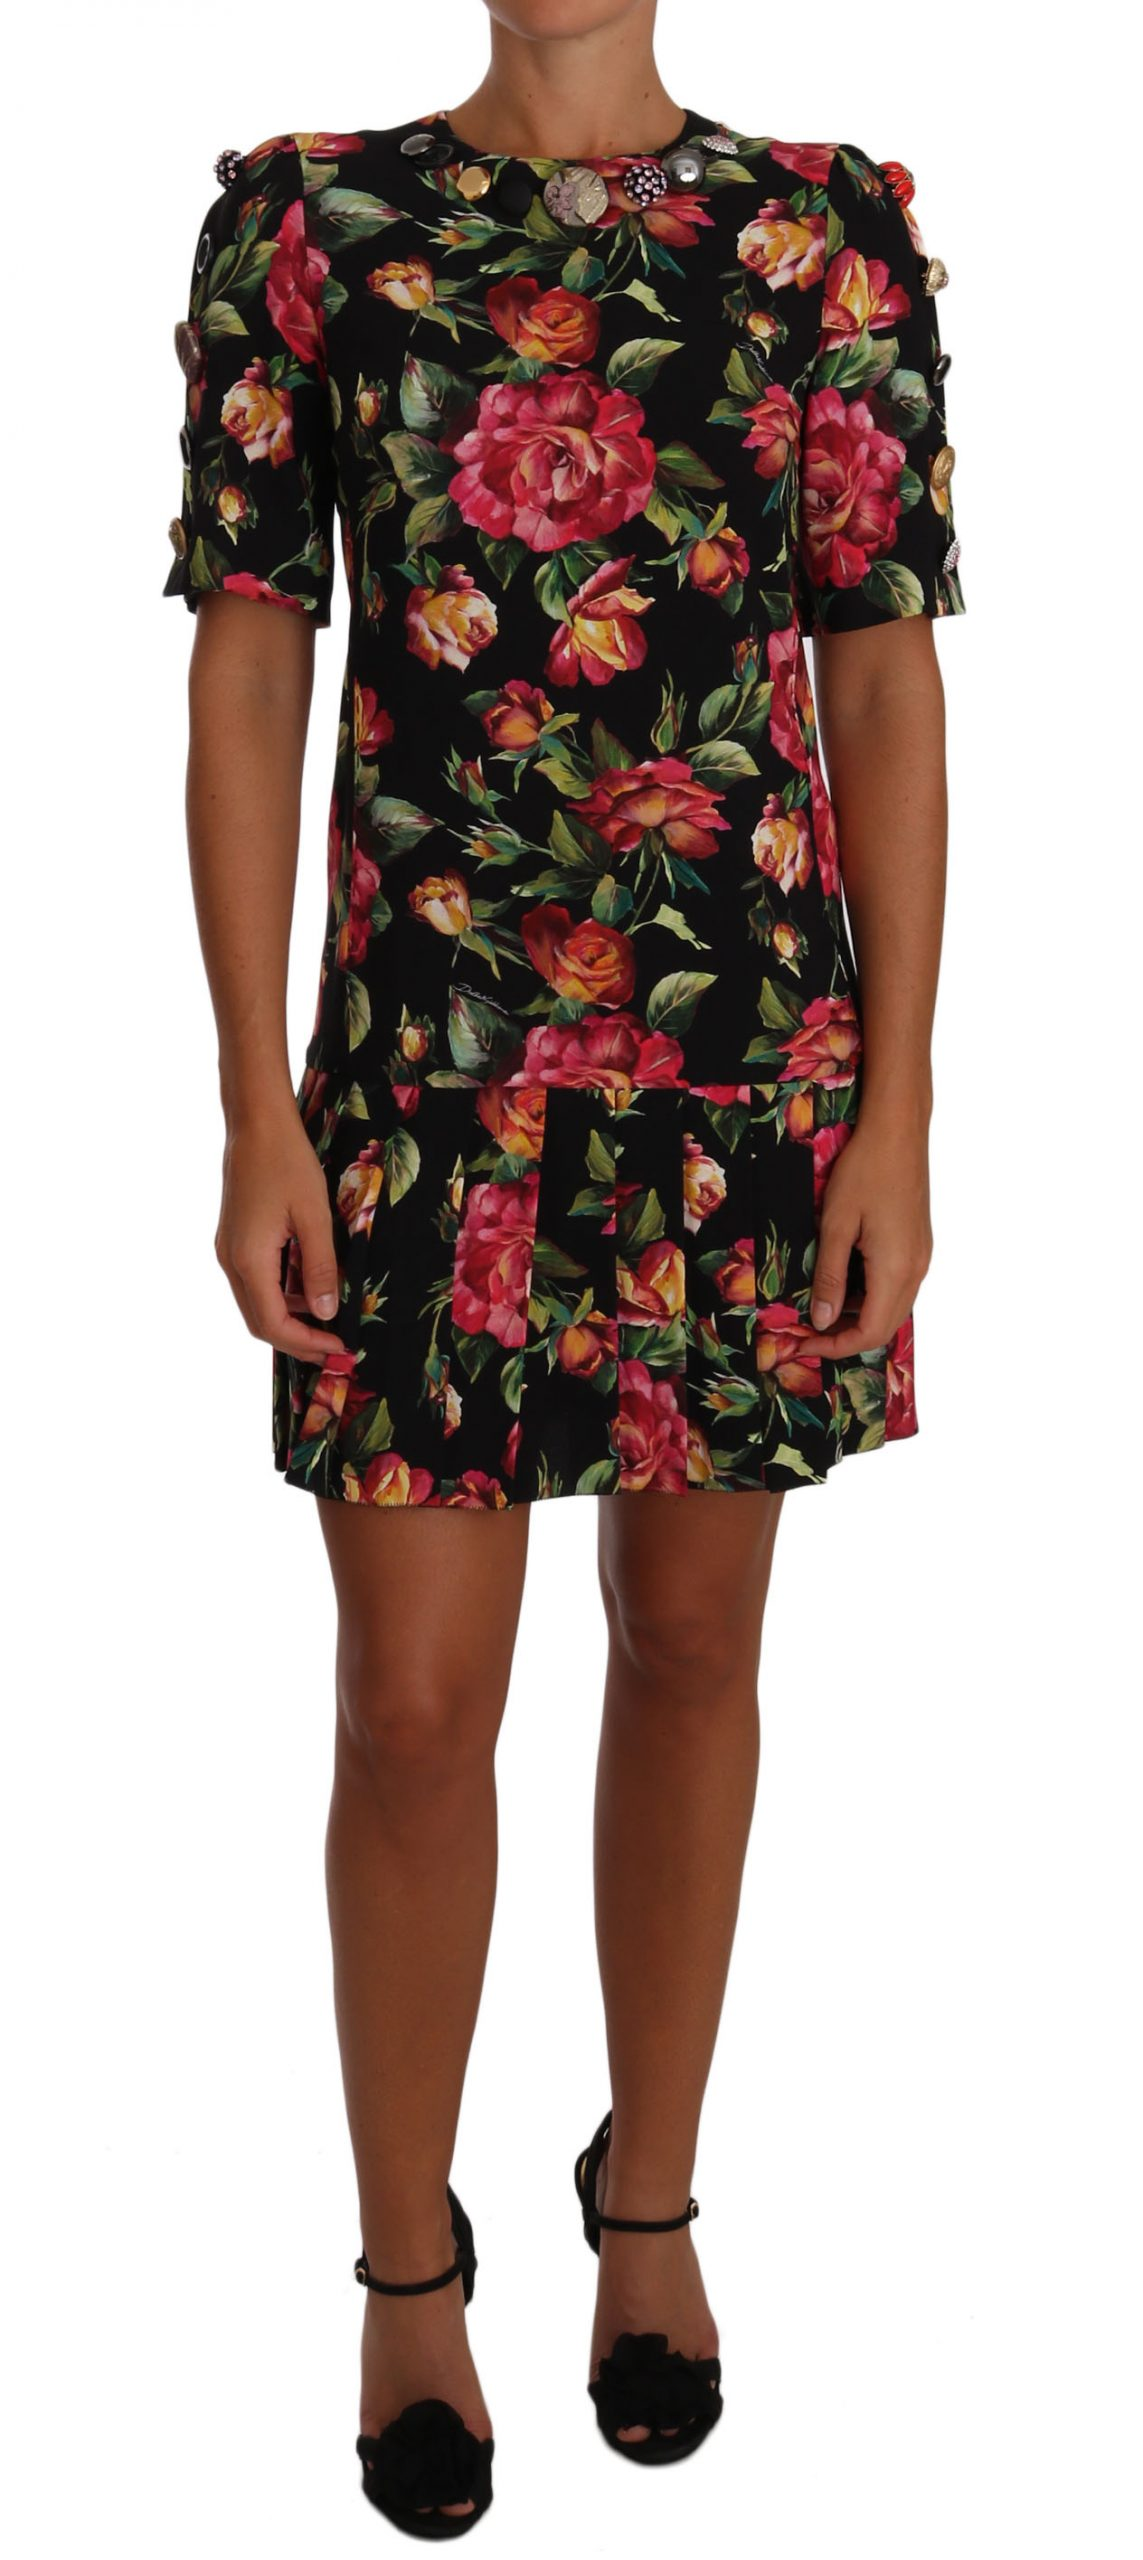 Dolce & Gabbana Women's Floral Crystal Buttons Dress Multicolor DR1444 - IT38|XS